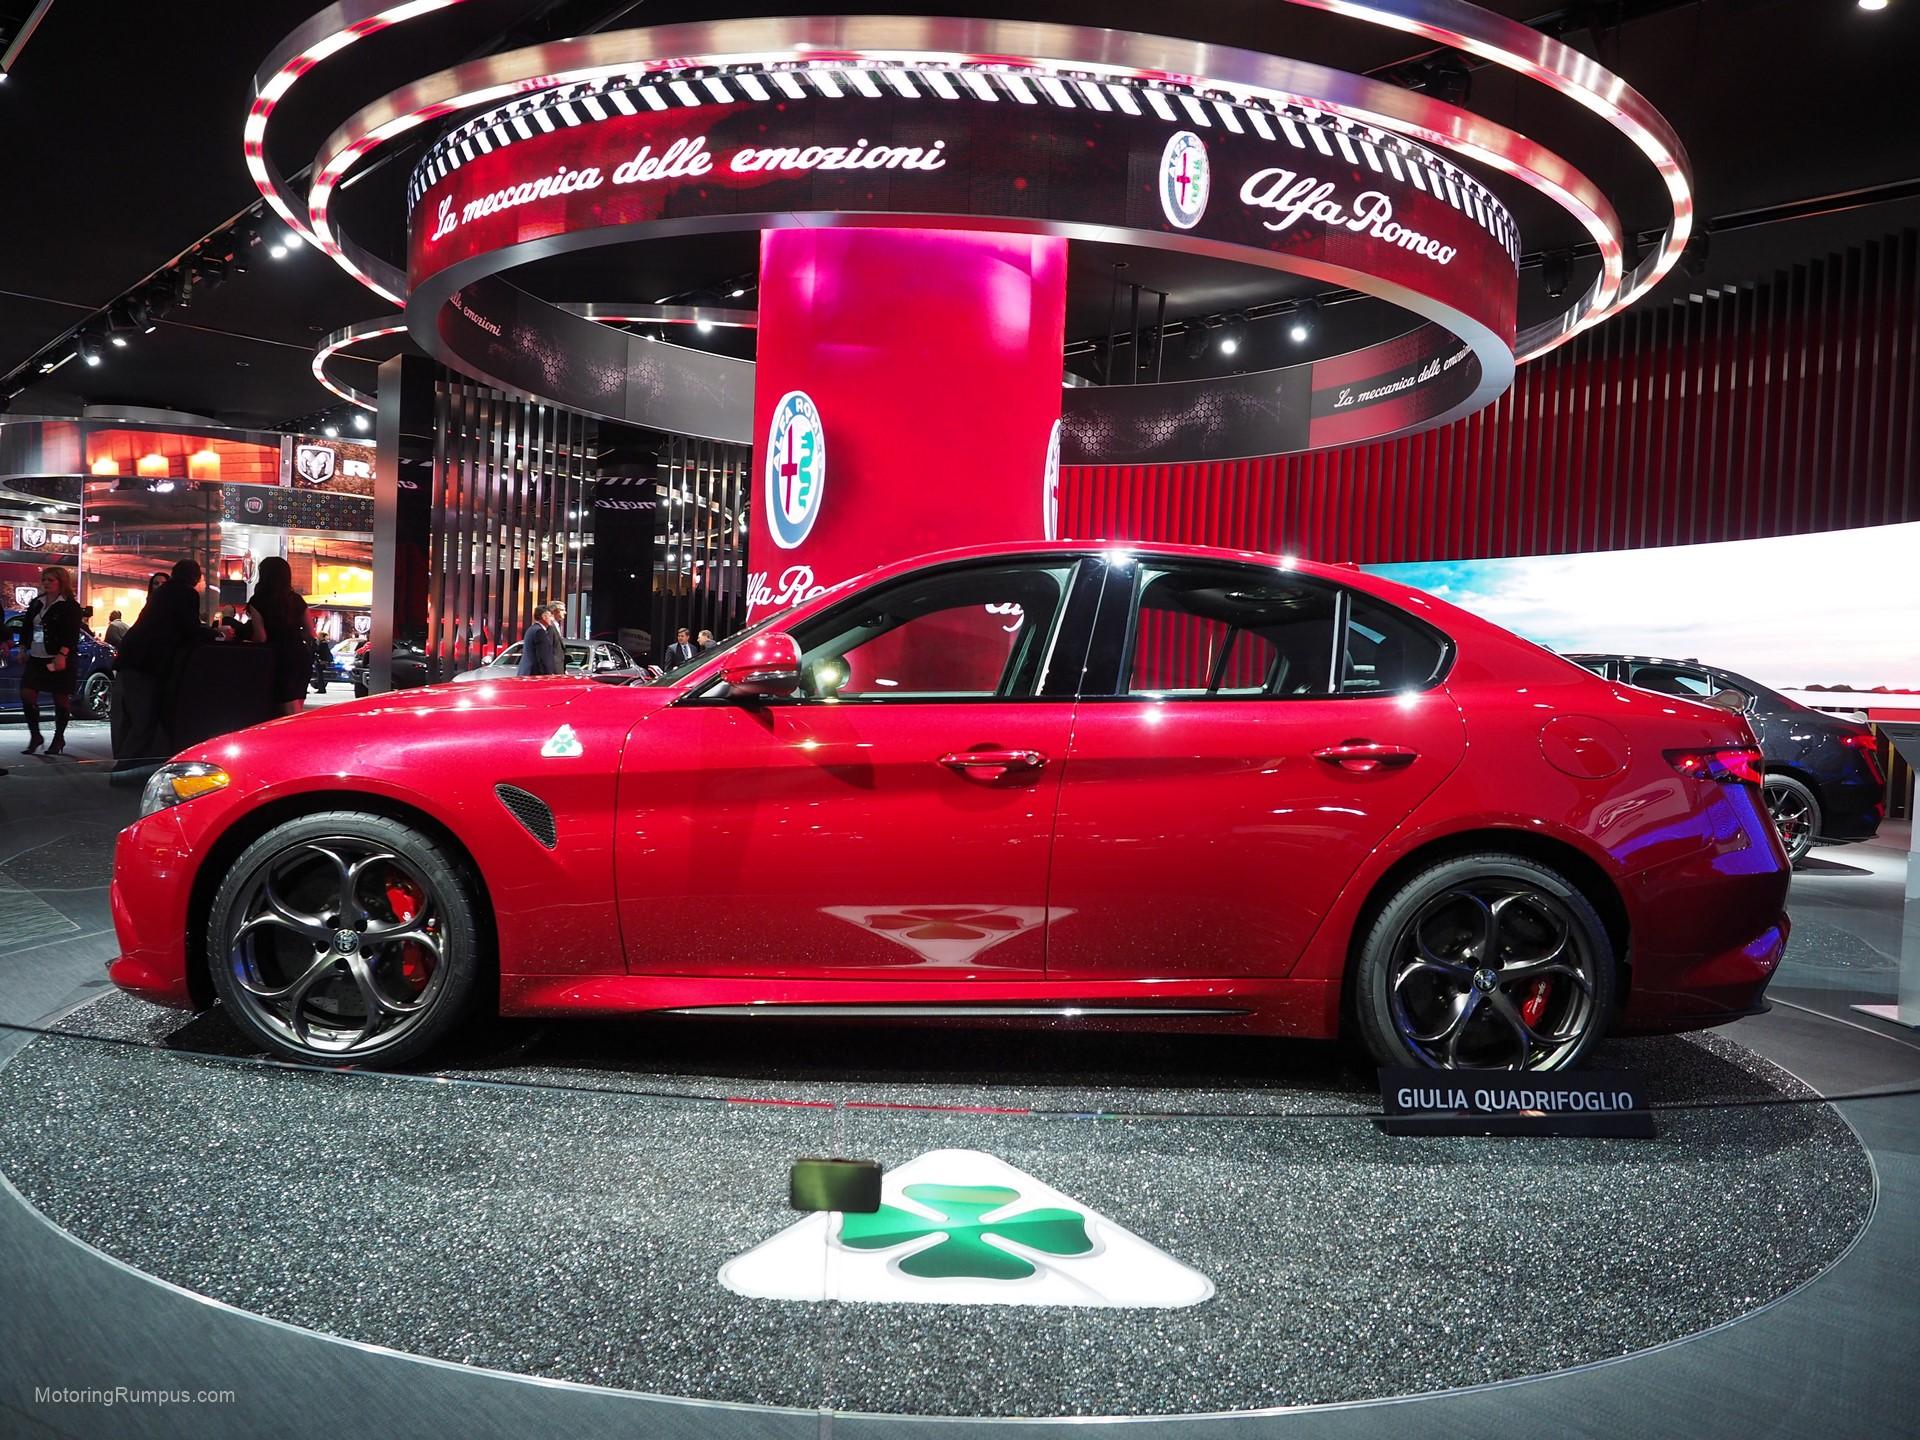 2016 Naias Alfa Romeo Giulia Quadrifoglio Red Motoring